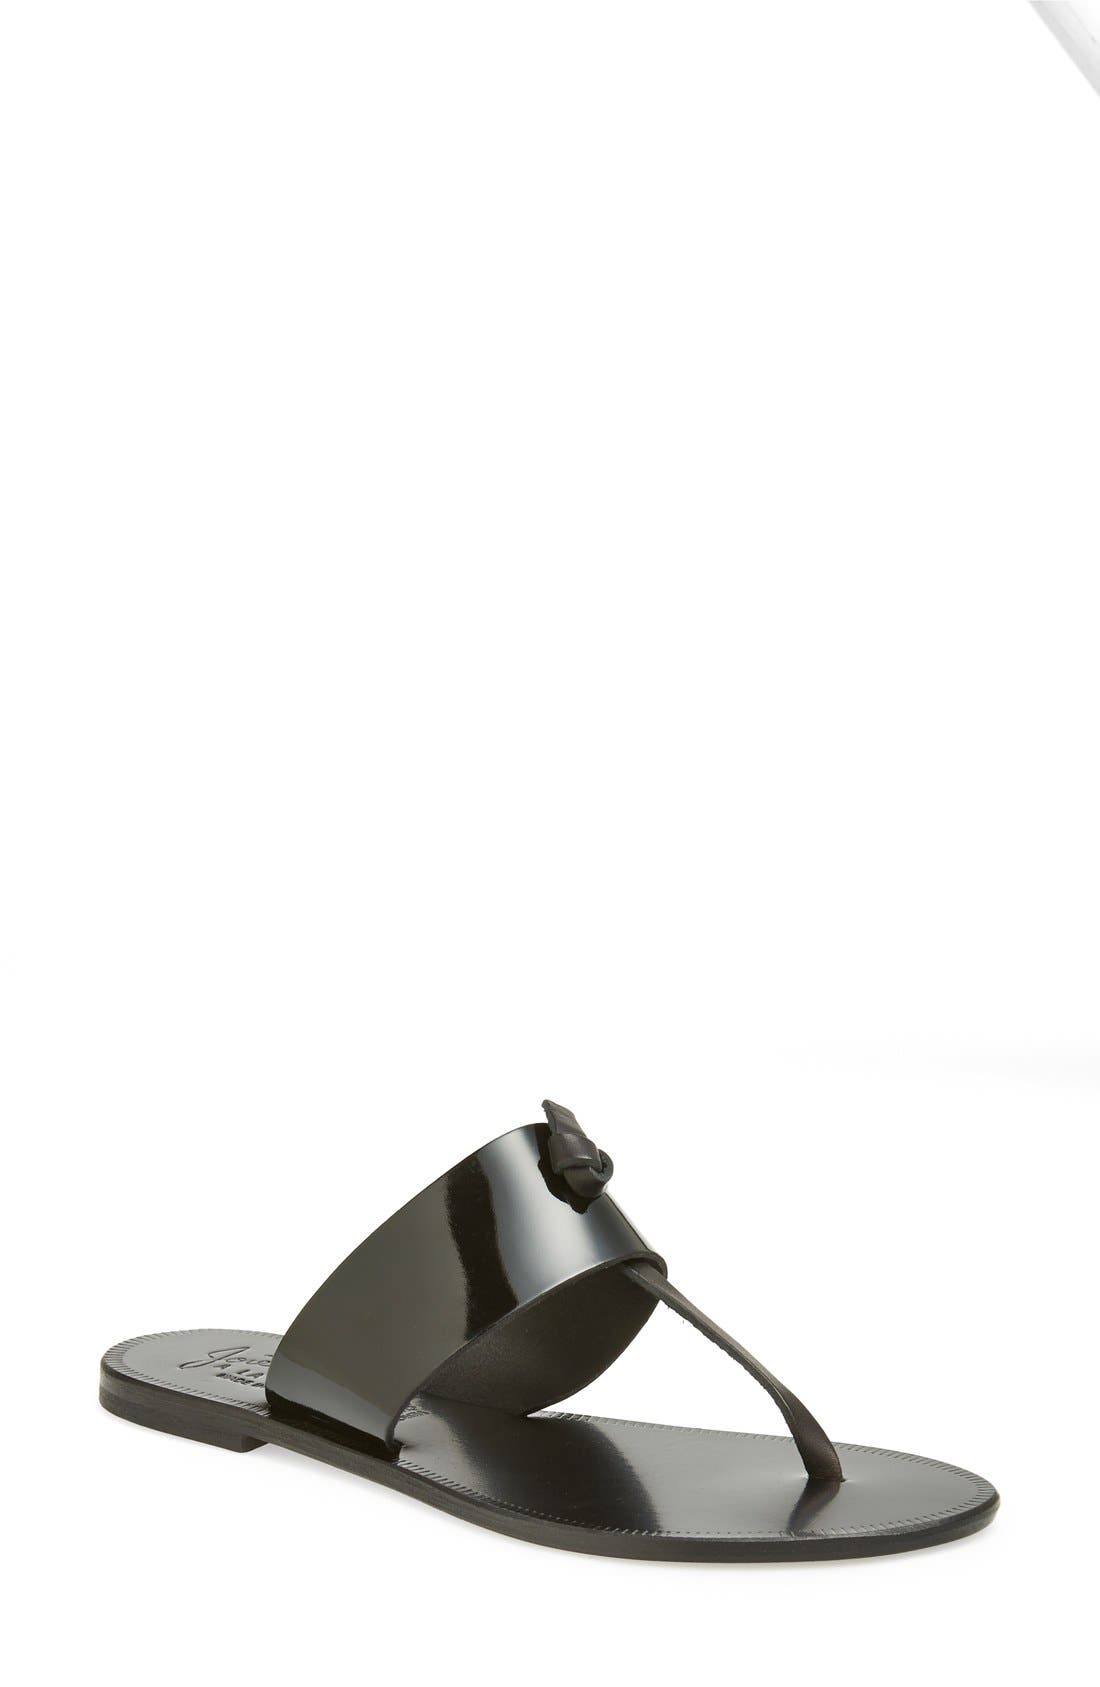 Alternate Image 1 Selected - Joie 'Nice' Sandal (Women)